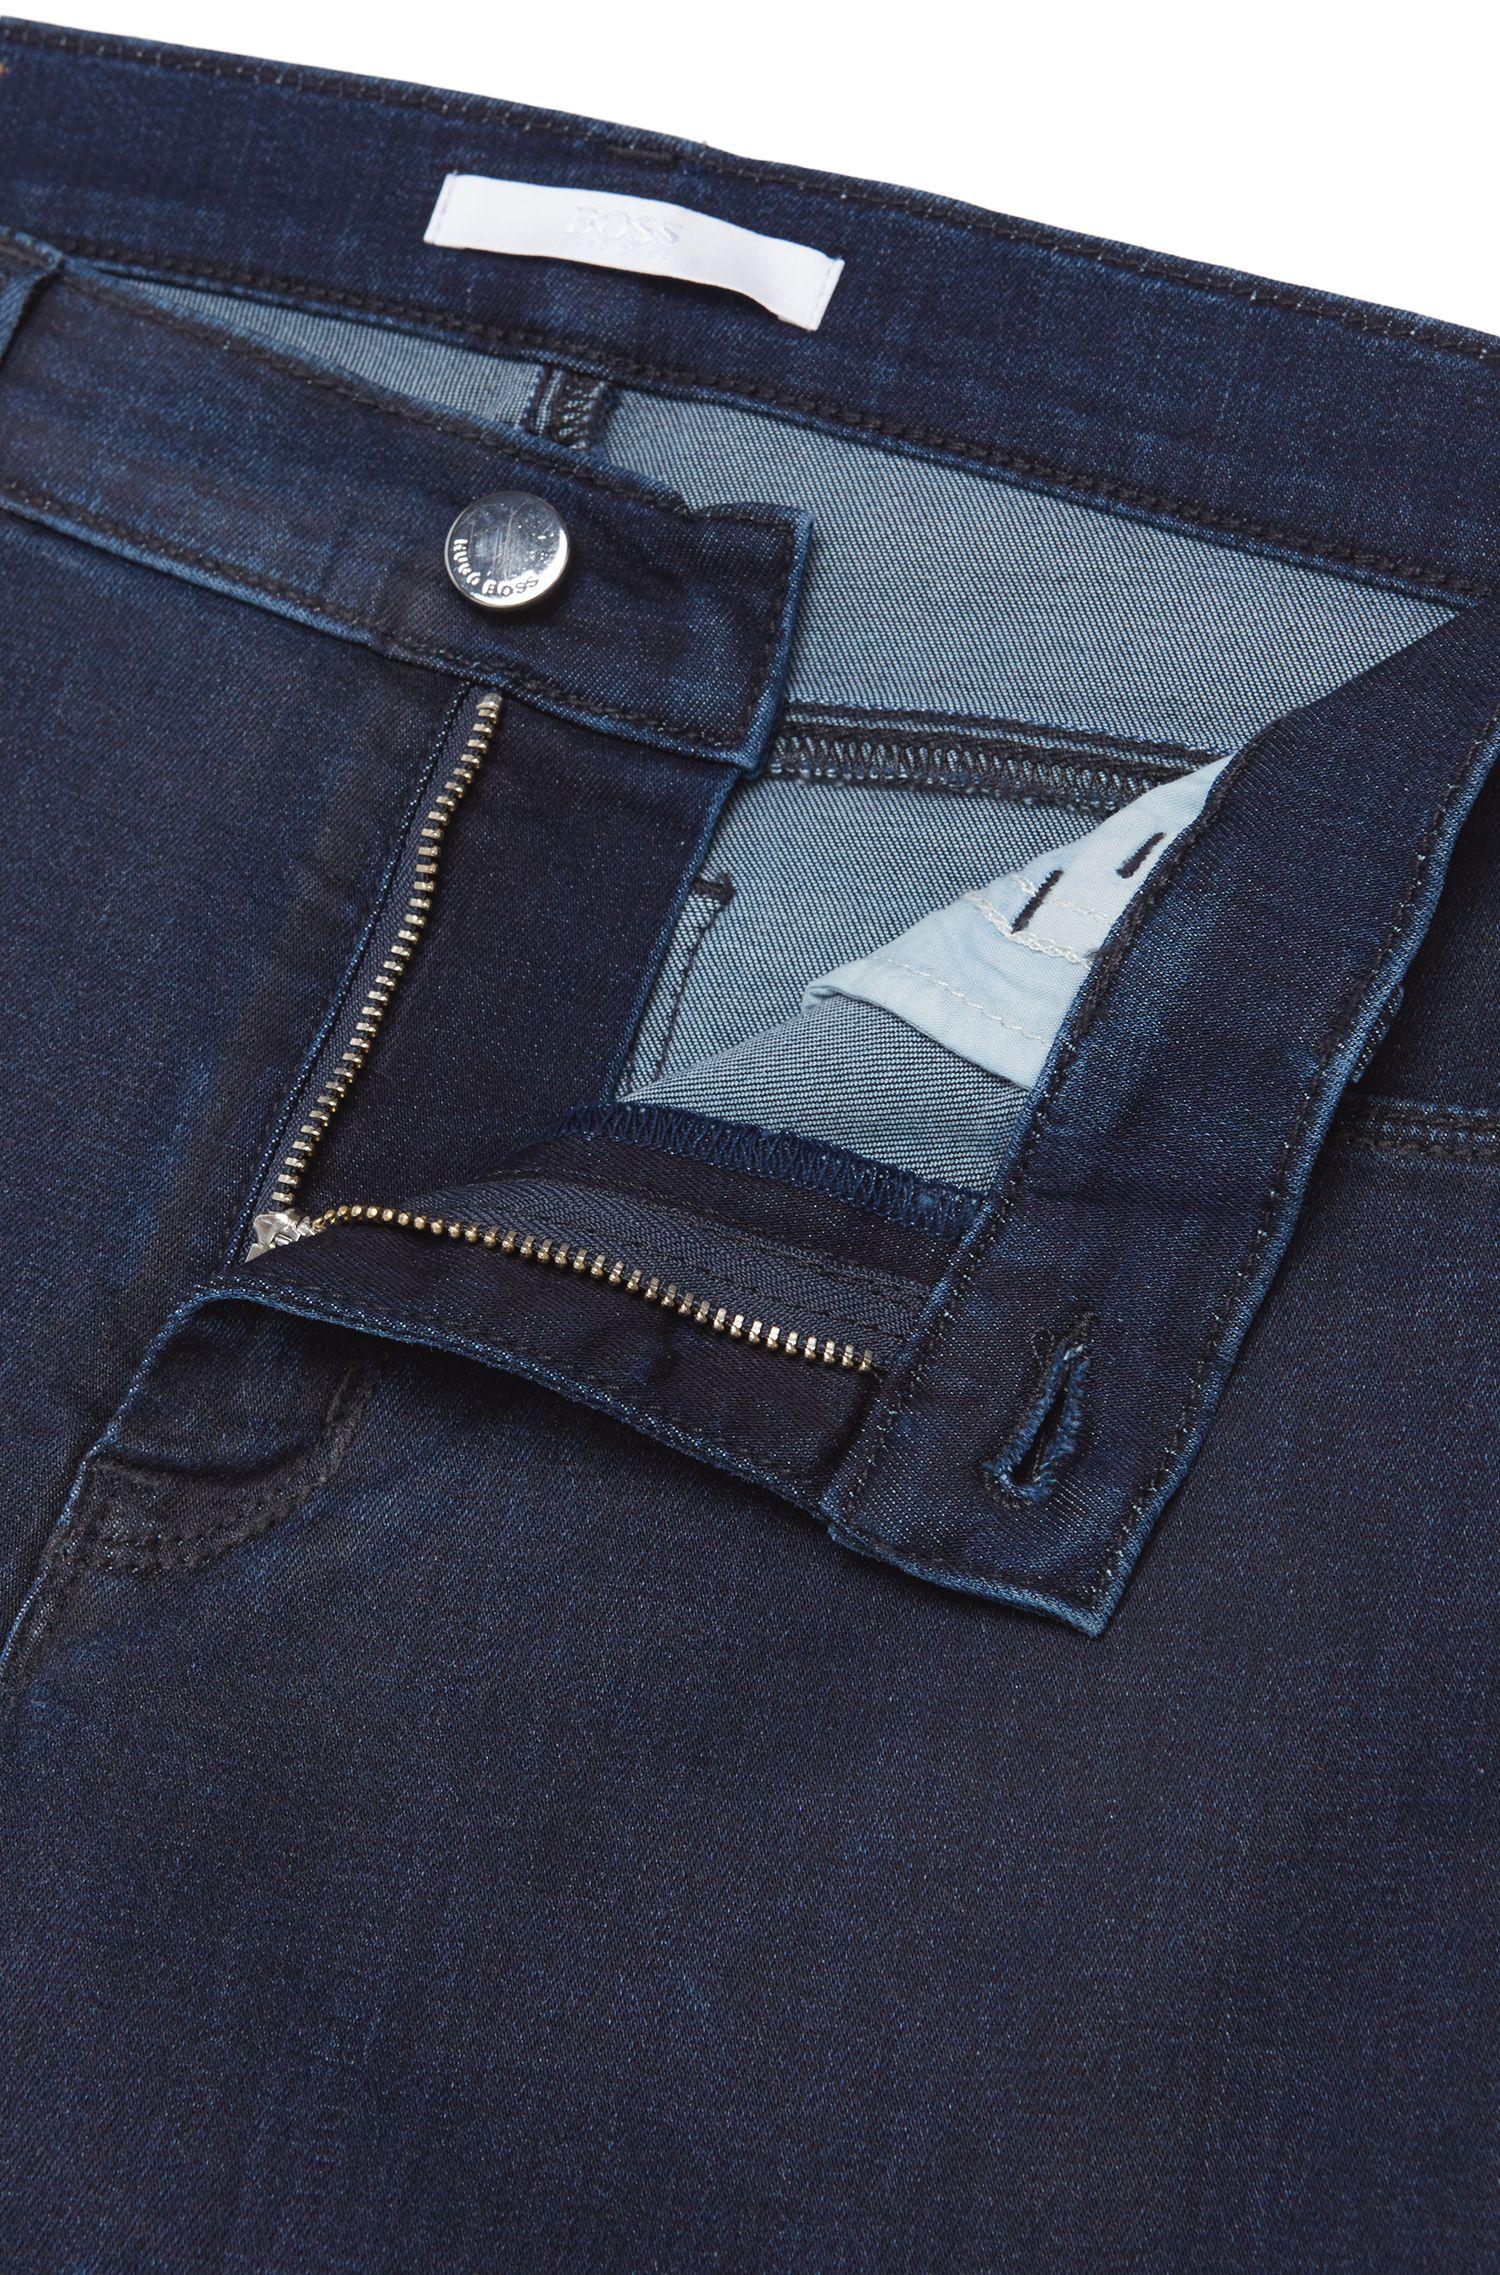 Slim-Fit Jeans aus Baumwoll-Mix in Cropped-Länge: 'Nafice'